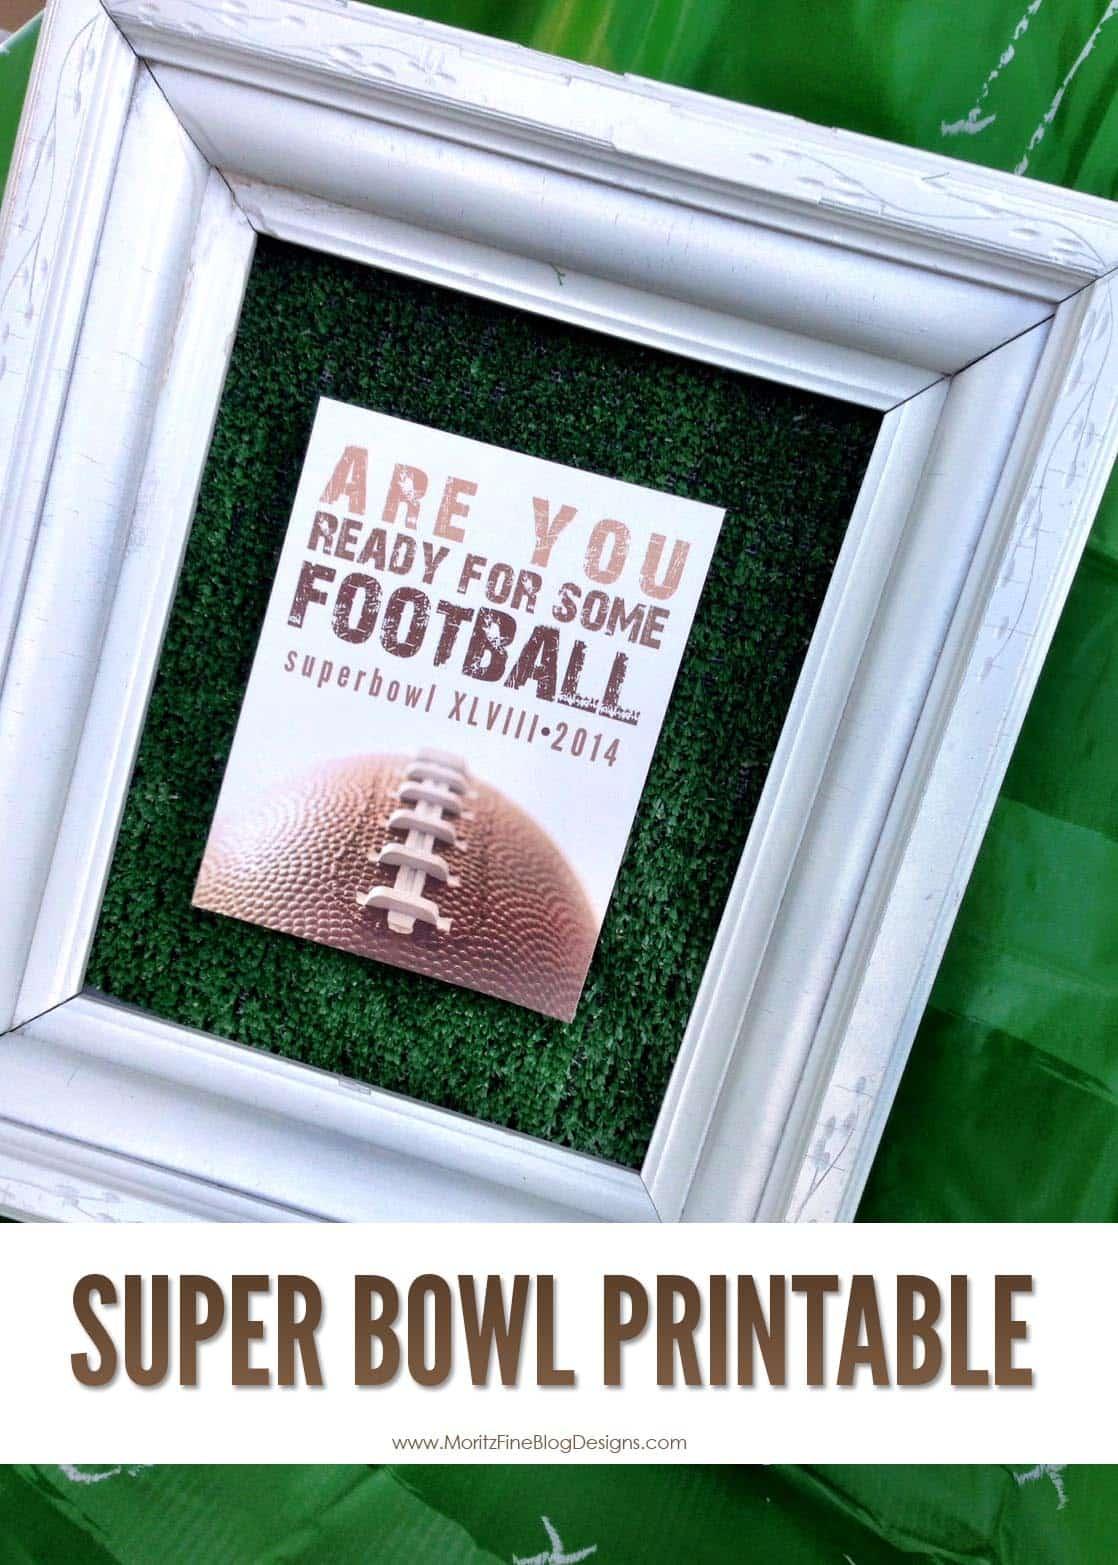 Super Bowl Printable and Invitation